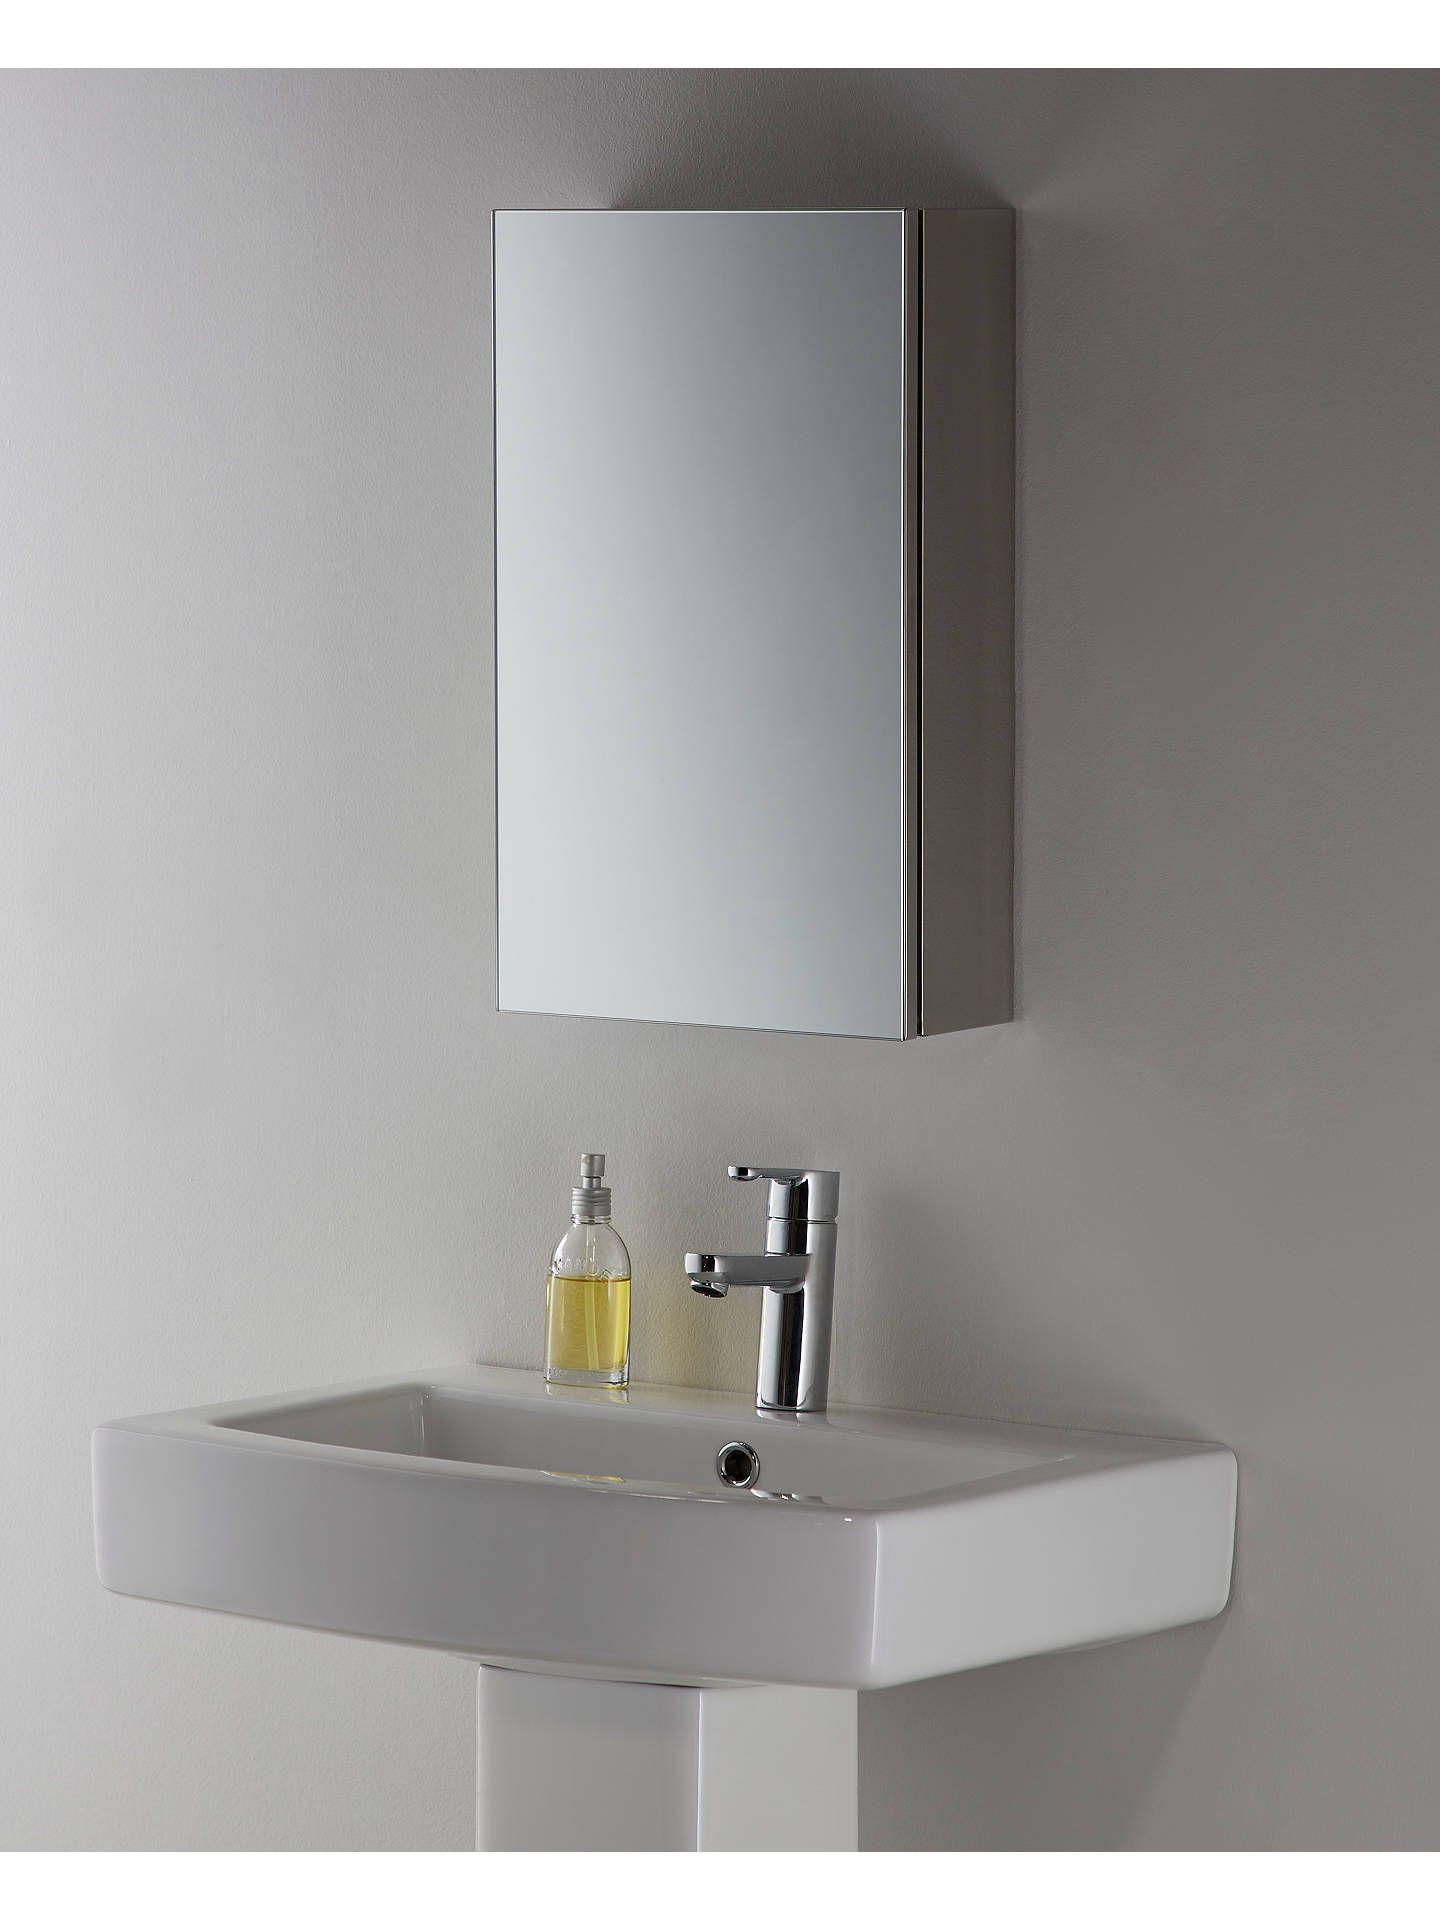 John Lewis Partners Small Single Mirrored Bathroom Cabinet Bathroom Mirror Cabinet Bathroom Mirror Bathroom